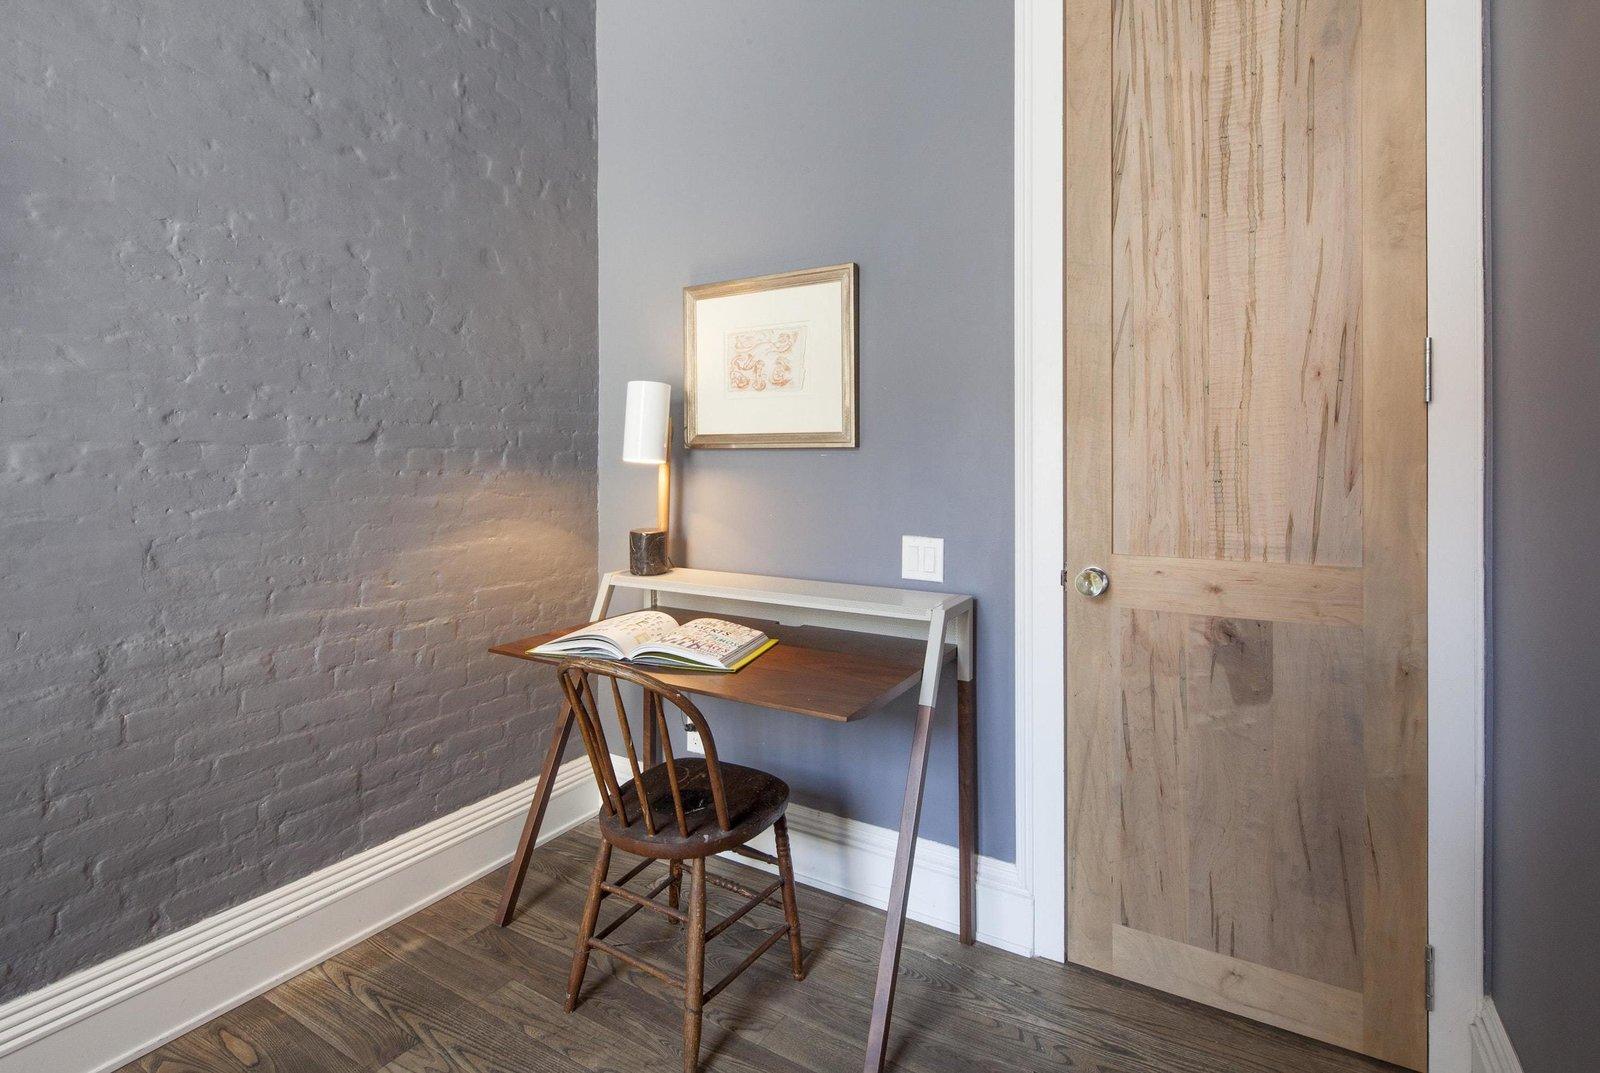 Office, Desk, Lamps, Chair, and Medium Hardwood Floor  Prince Street